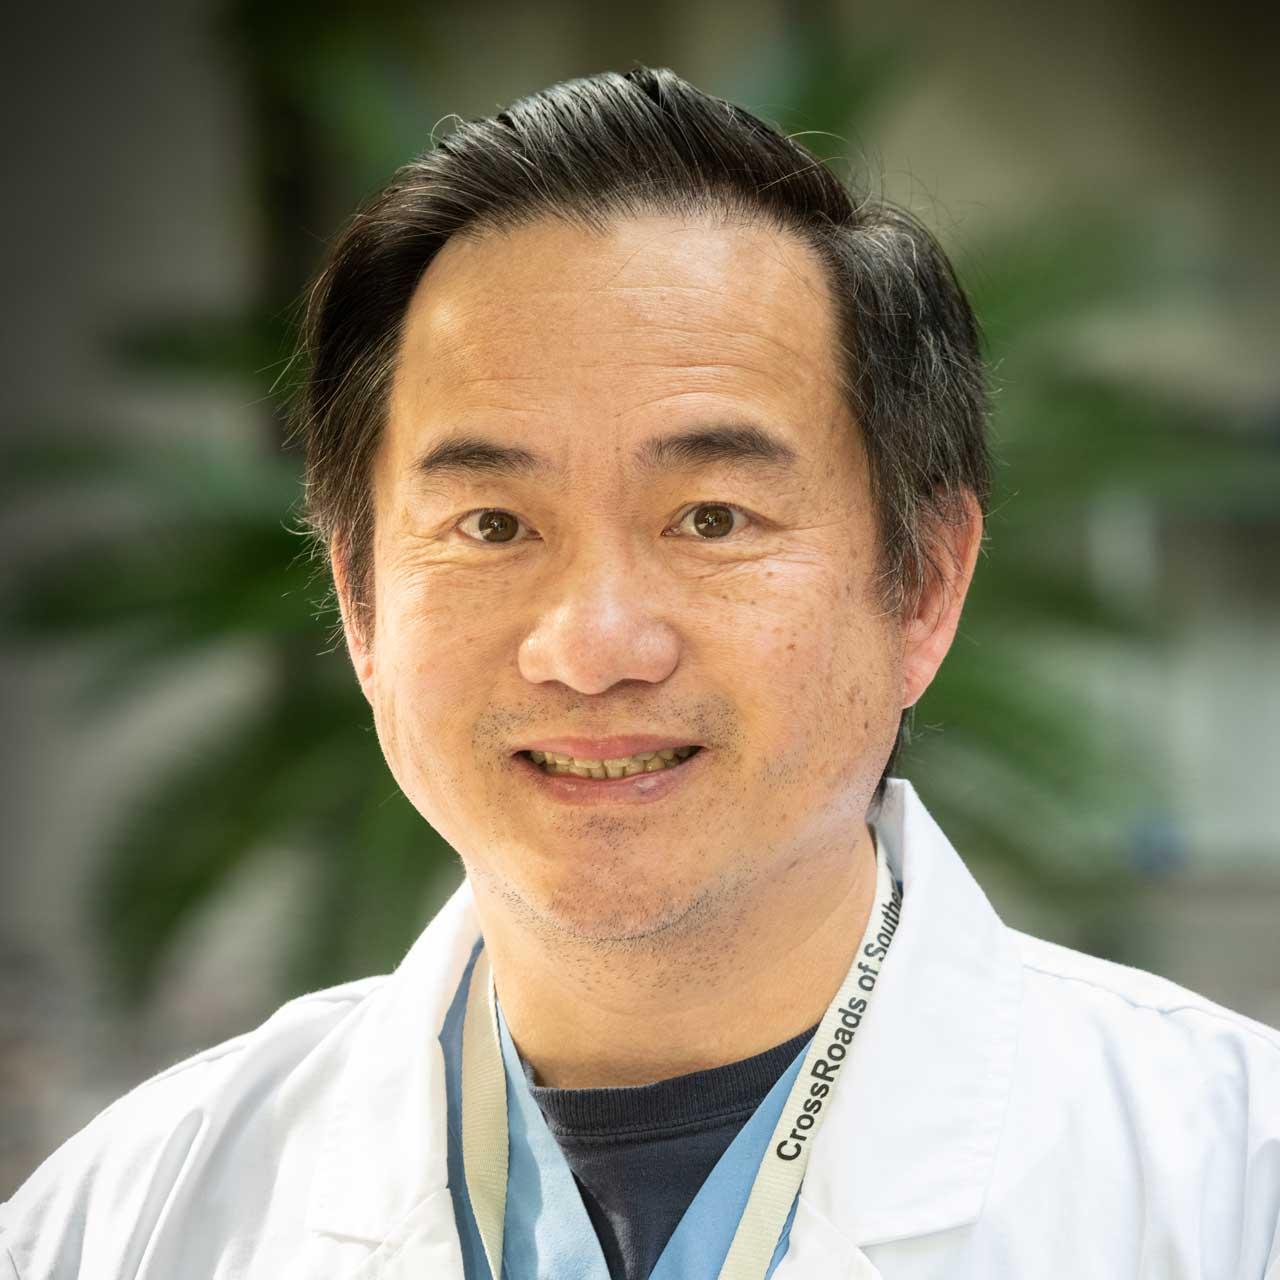 Thomas C. Yee, MD